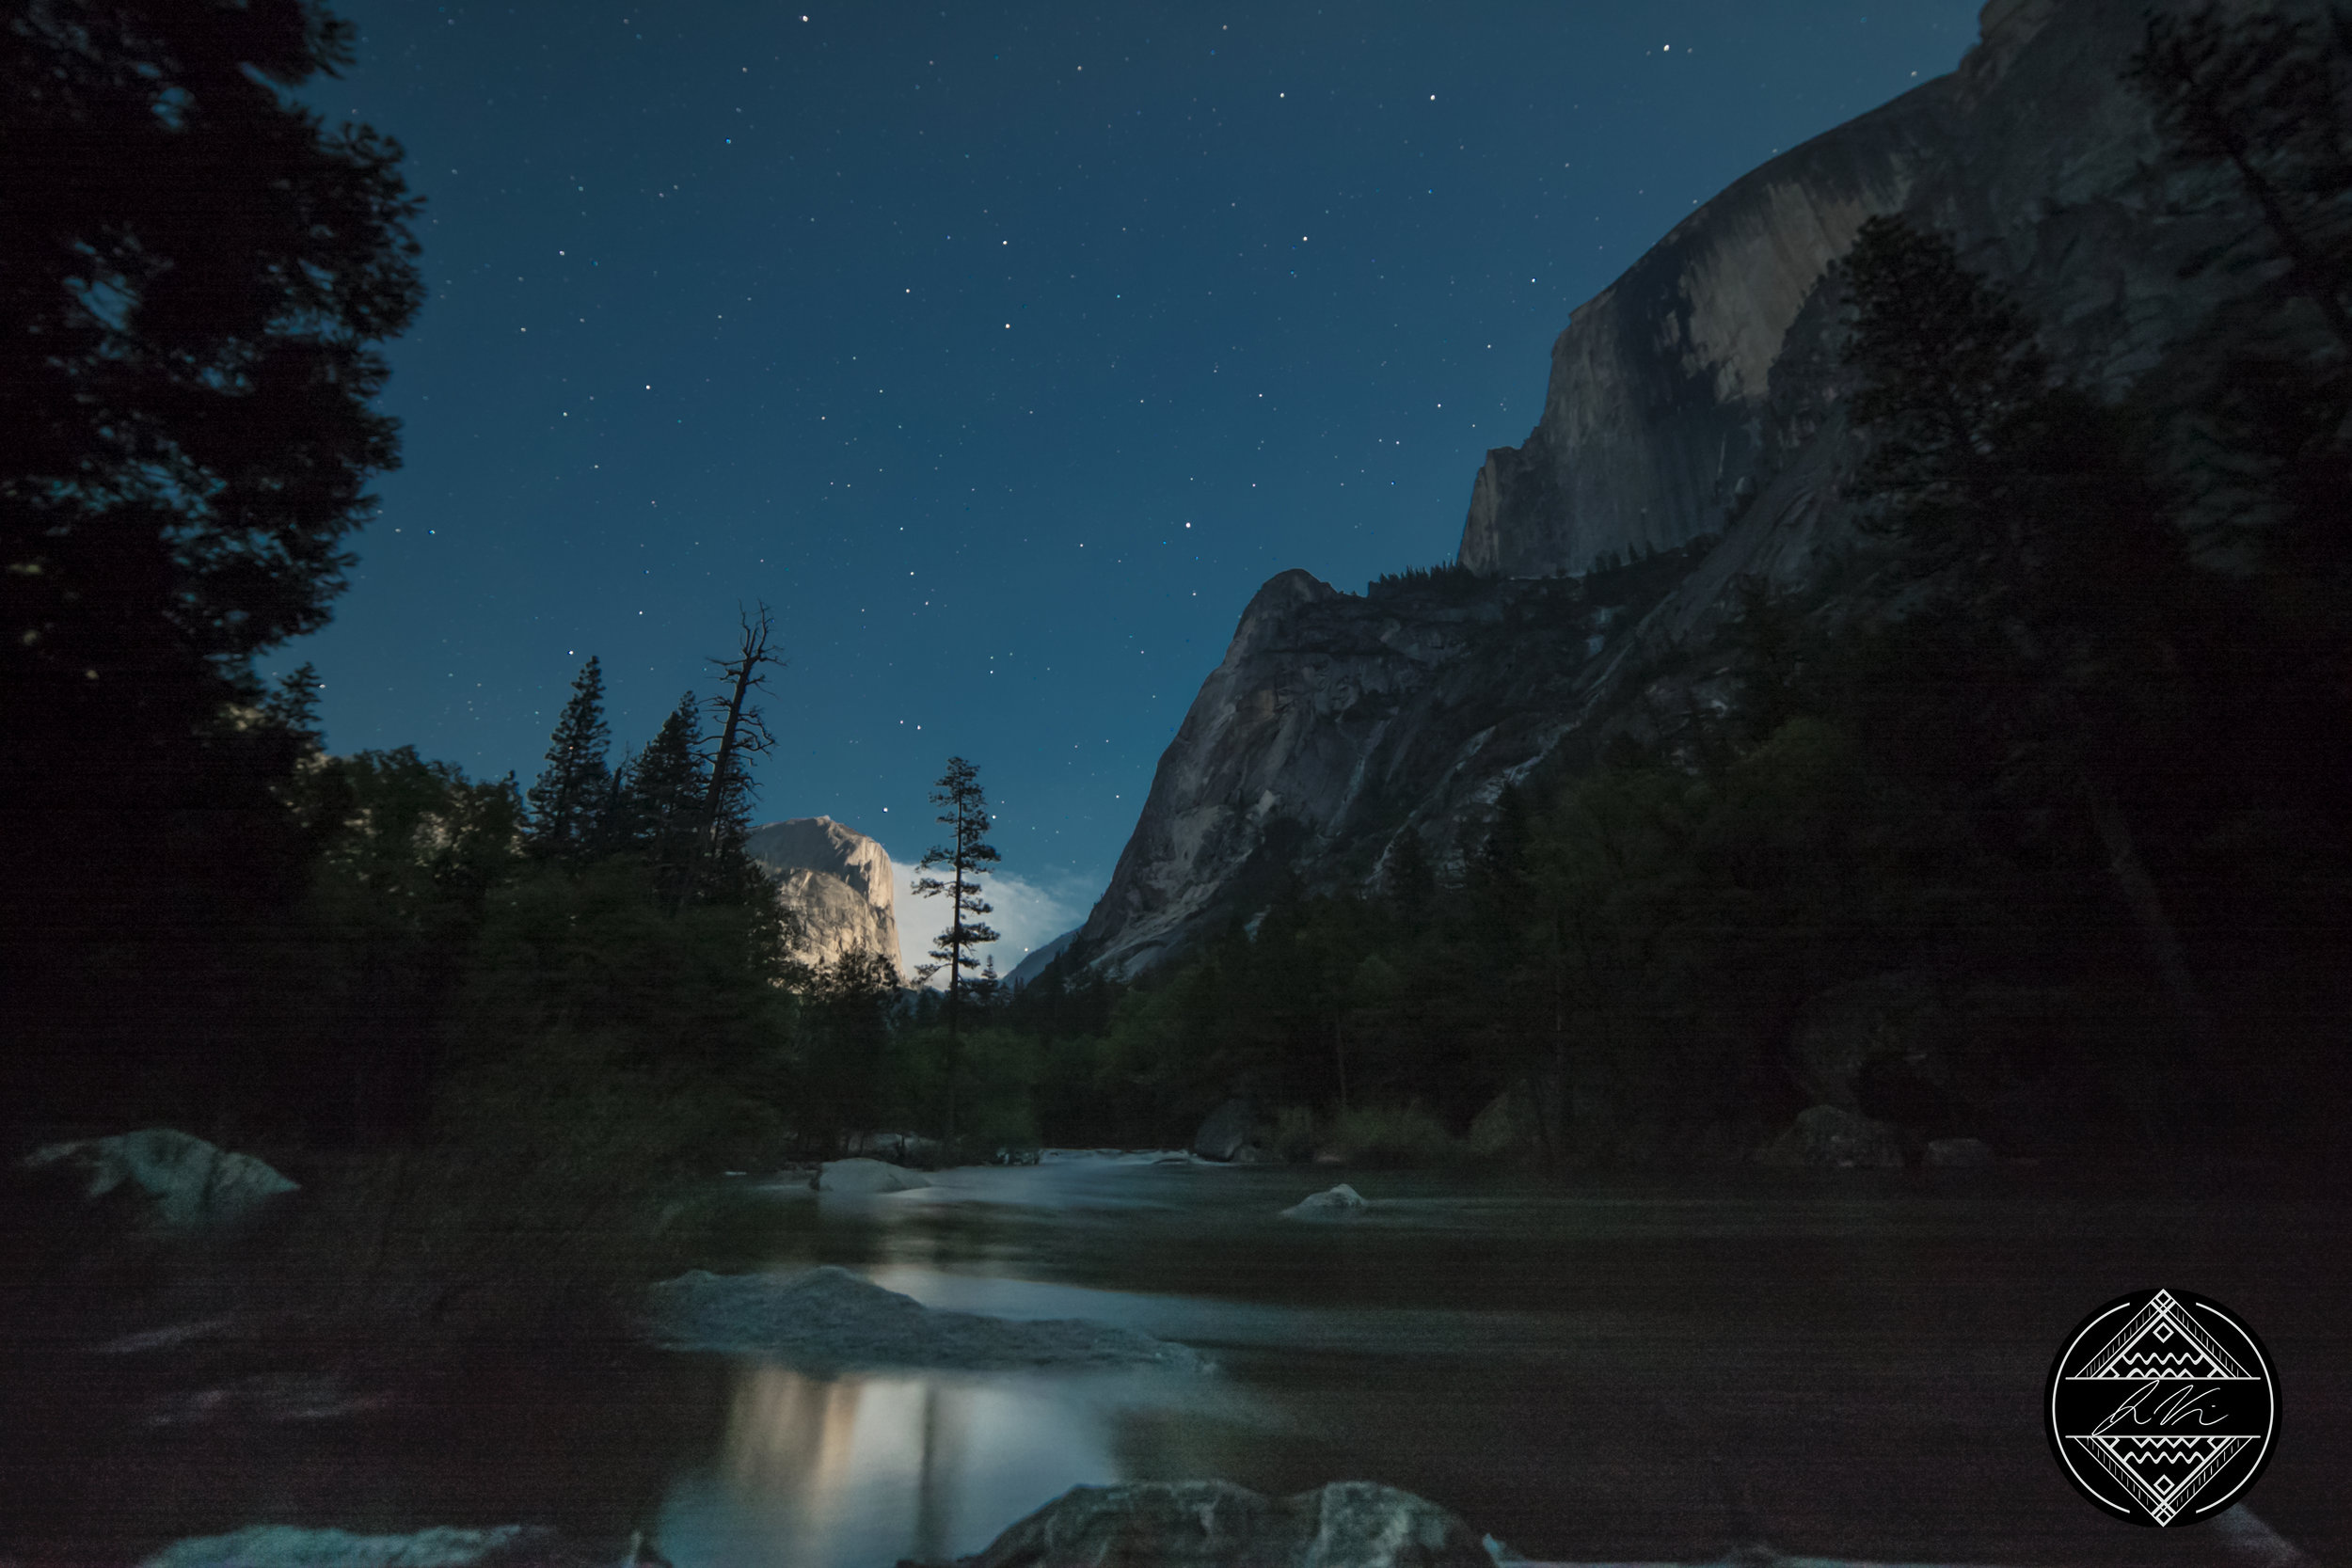 YOSEMITE_MIRRORLAKE_NIGHT_REFLECTION.jpg